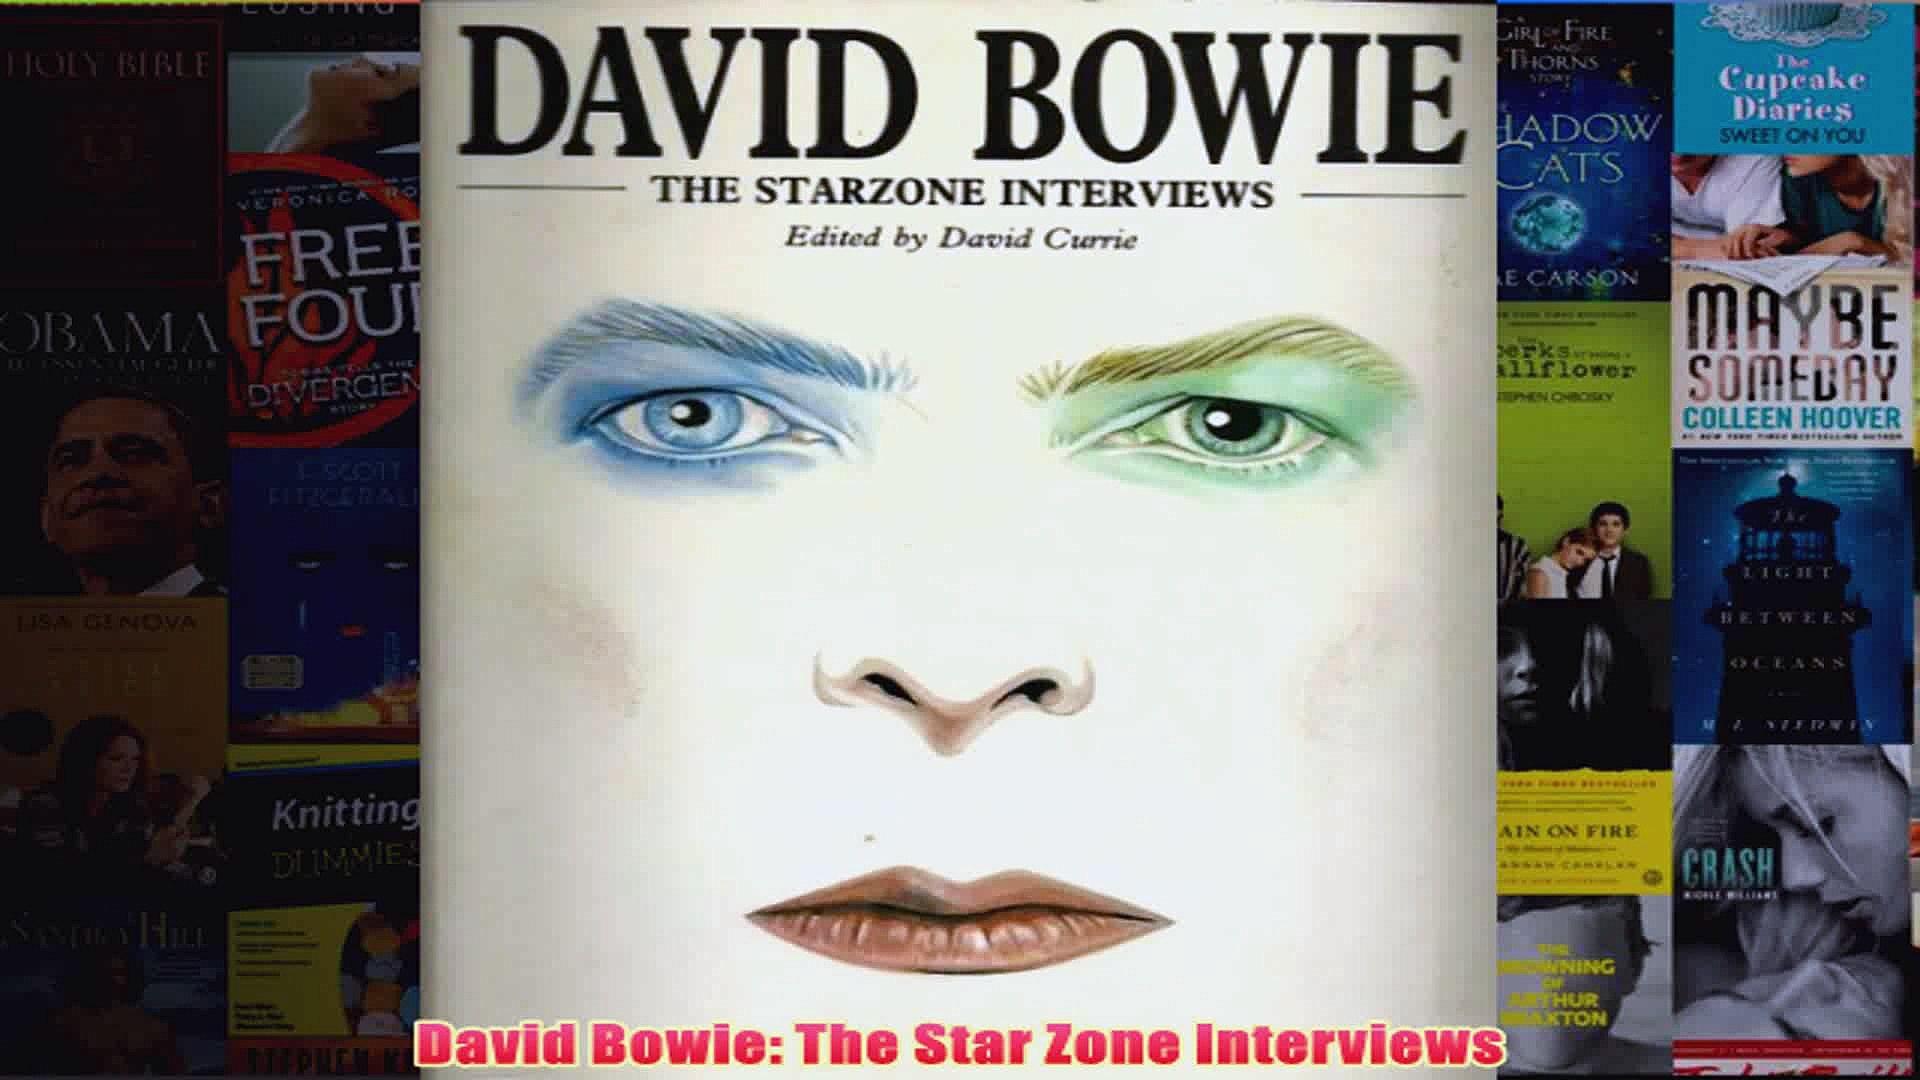 David Bowie The Star Zone Interviews